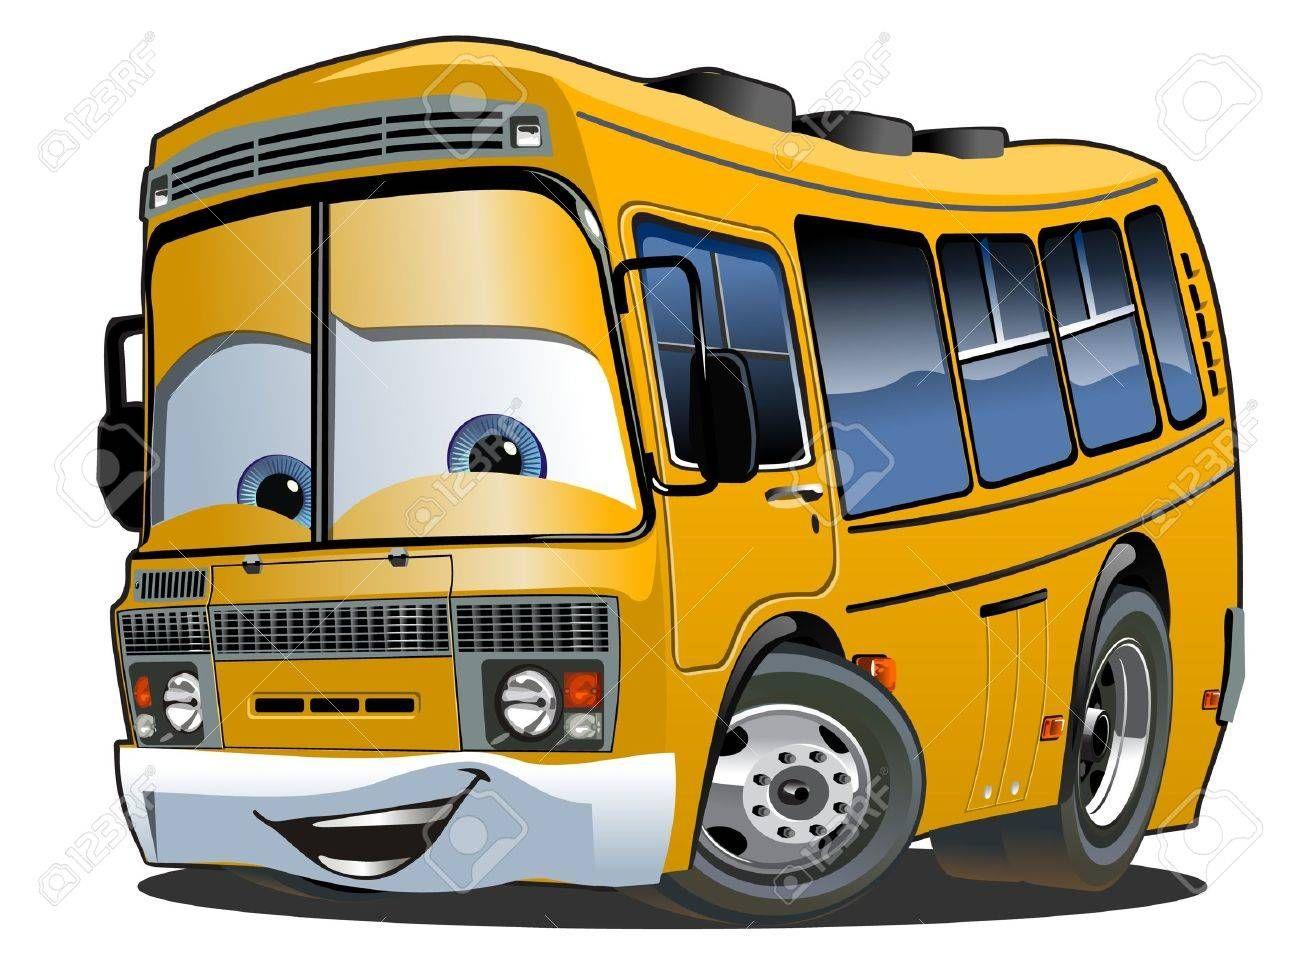 Cartoon School Bus Aff Cartoon School Bus Cartoon